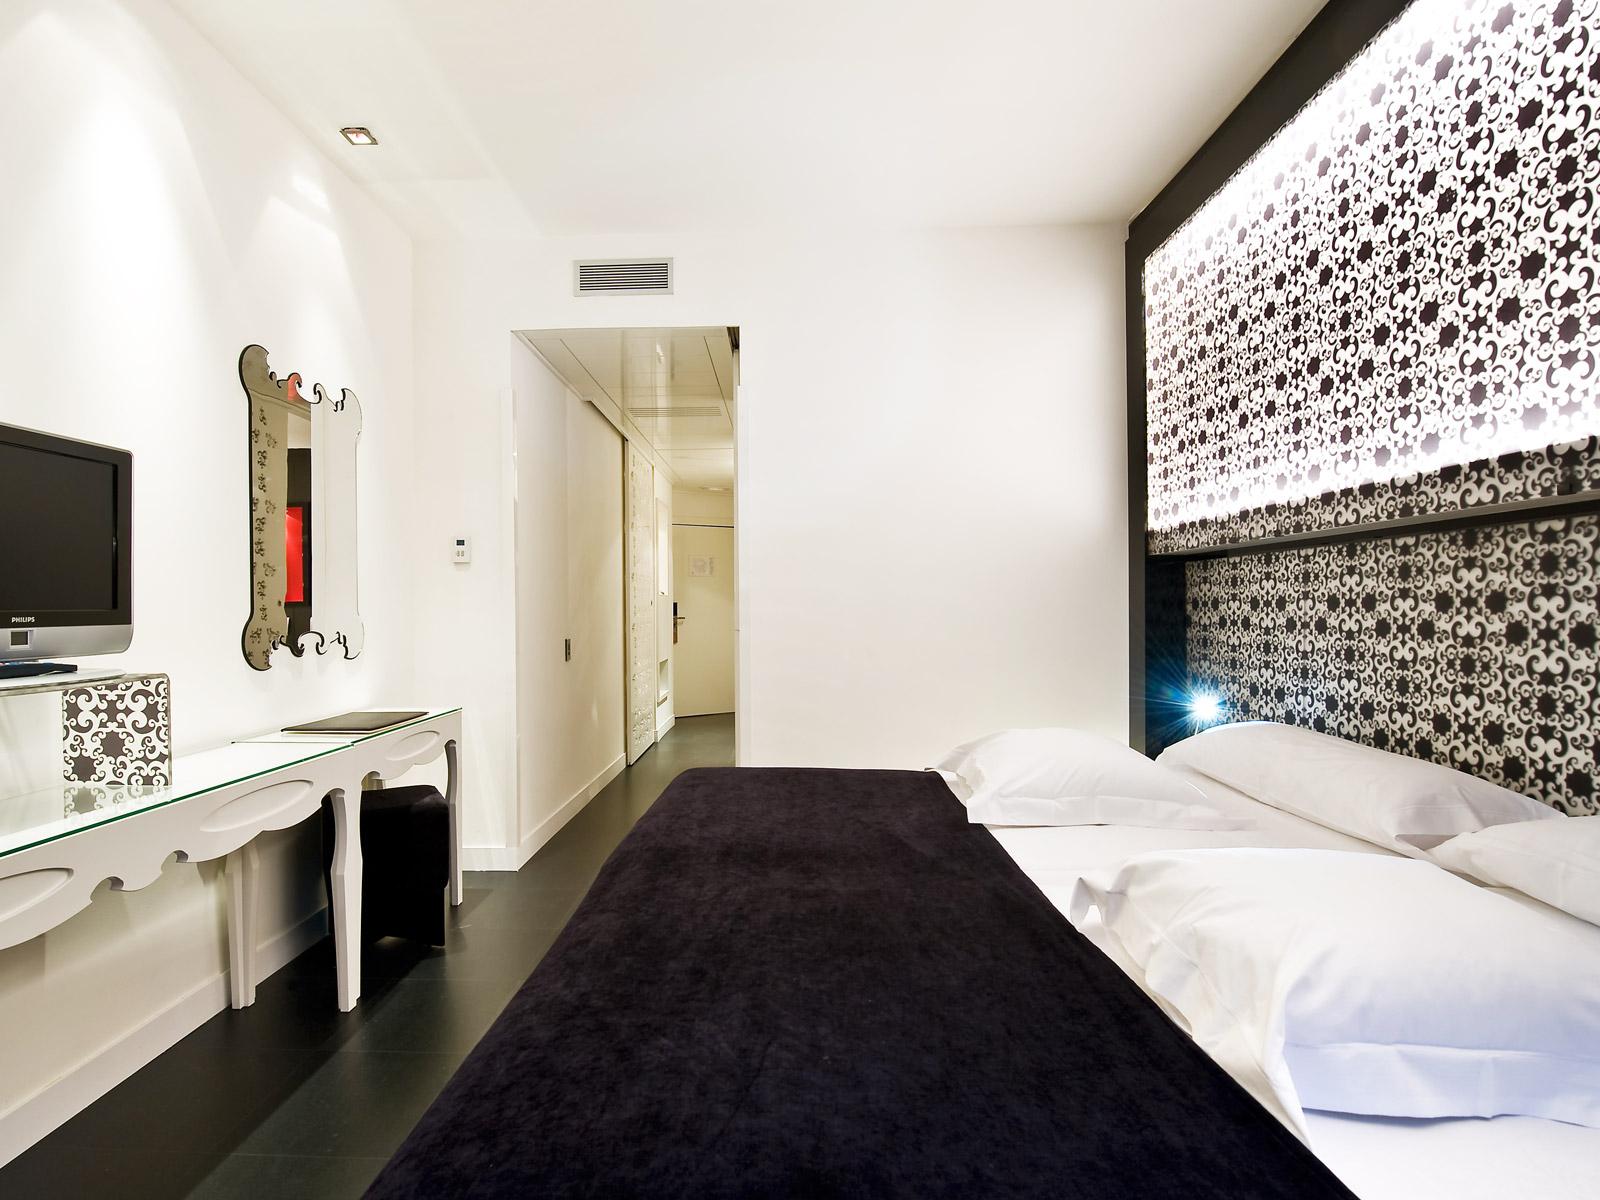 Rooms Hotel Madrid Vía 66 - Vincci Hotels - Single Room